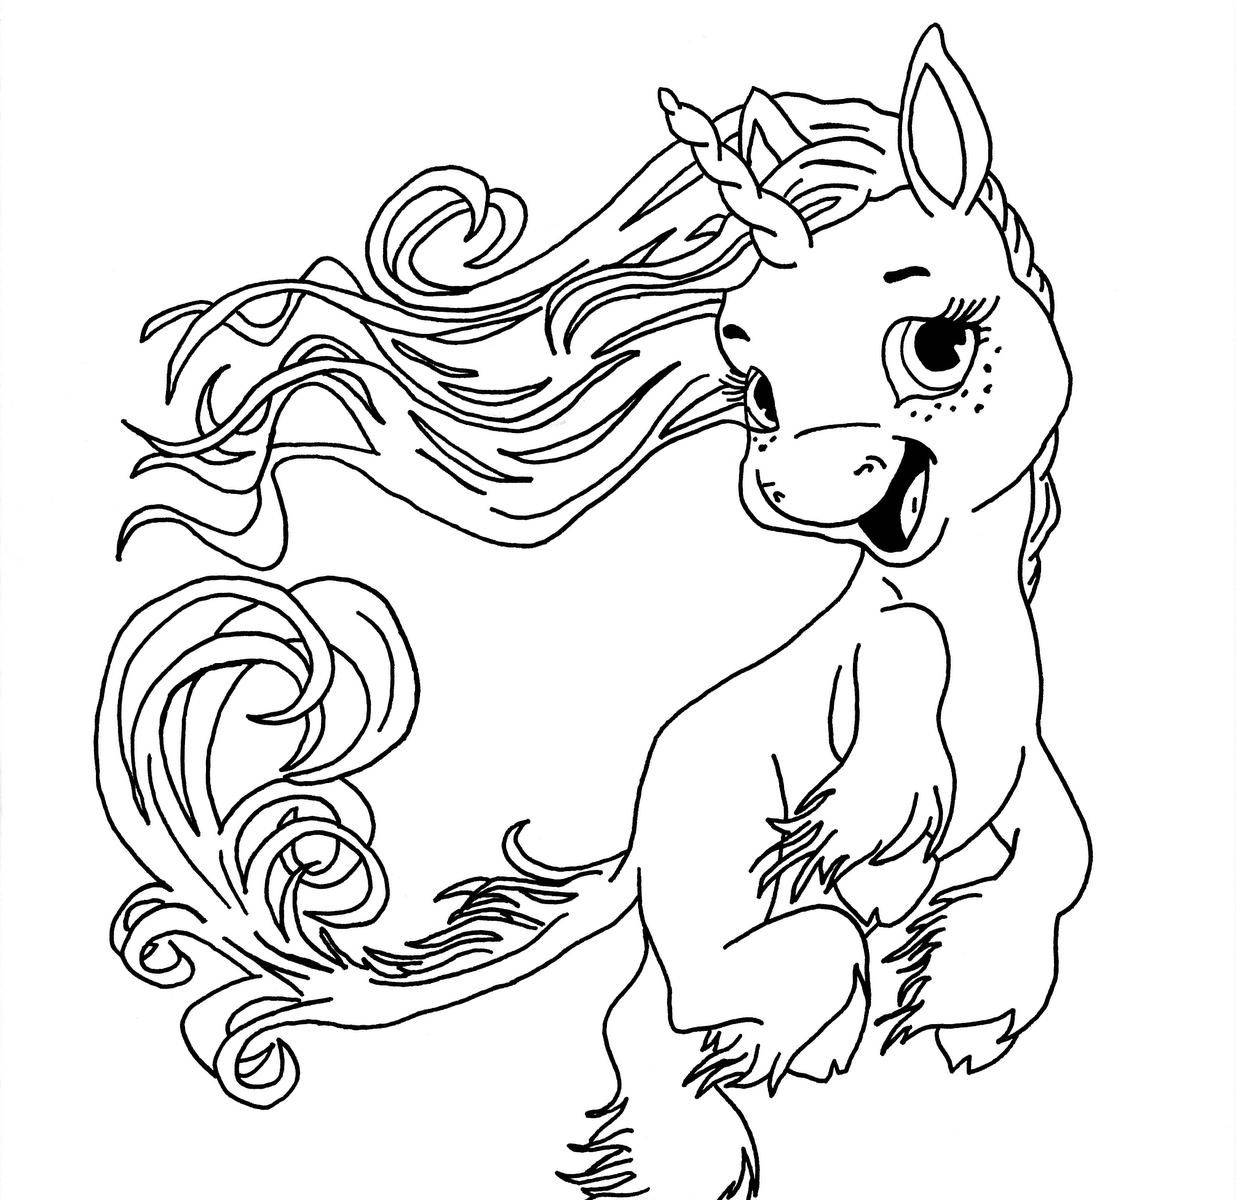 Unicorns Drawing At GetDrawings.com